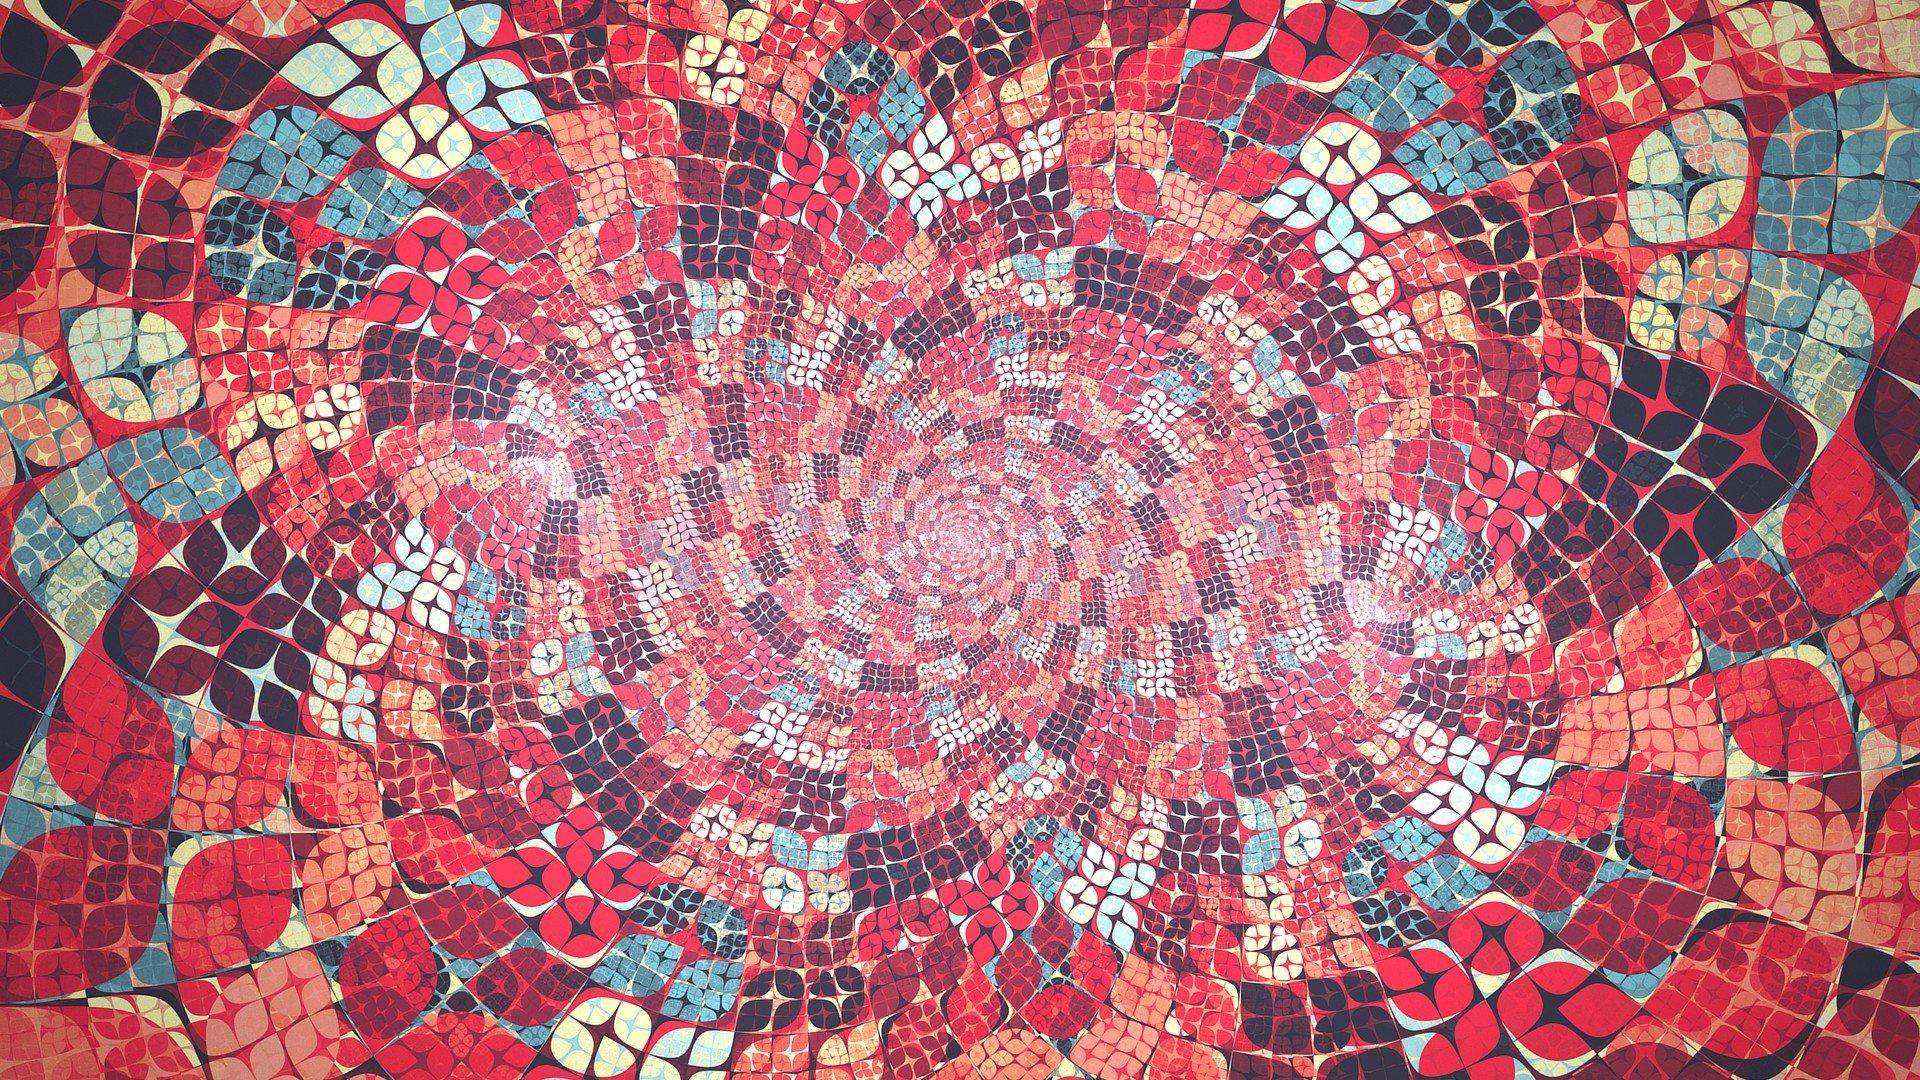 truchets, Abstract, Fractal, Artwork, Digital art, Red HD ...